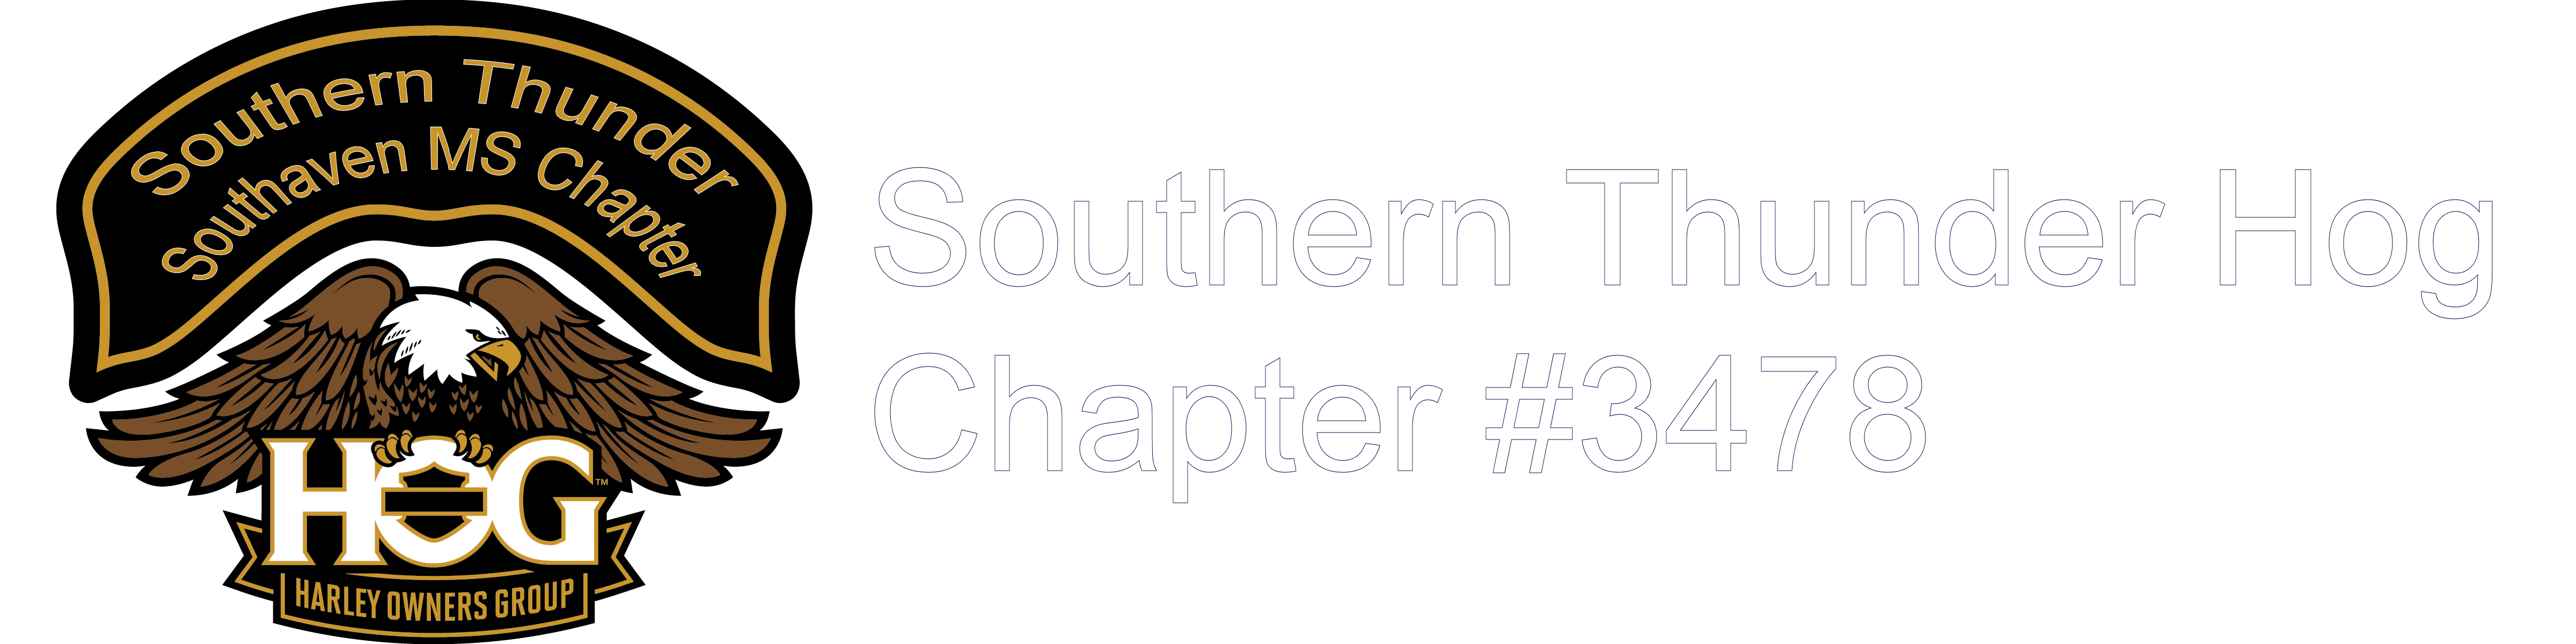 Southern Thunder HOG